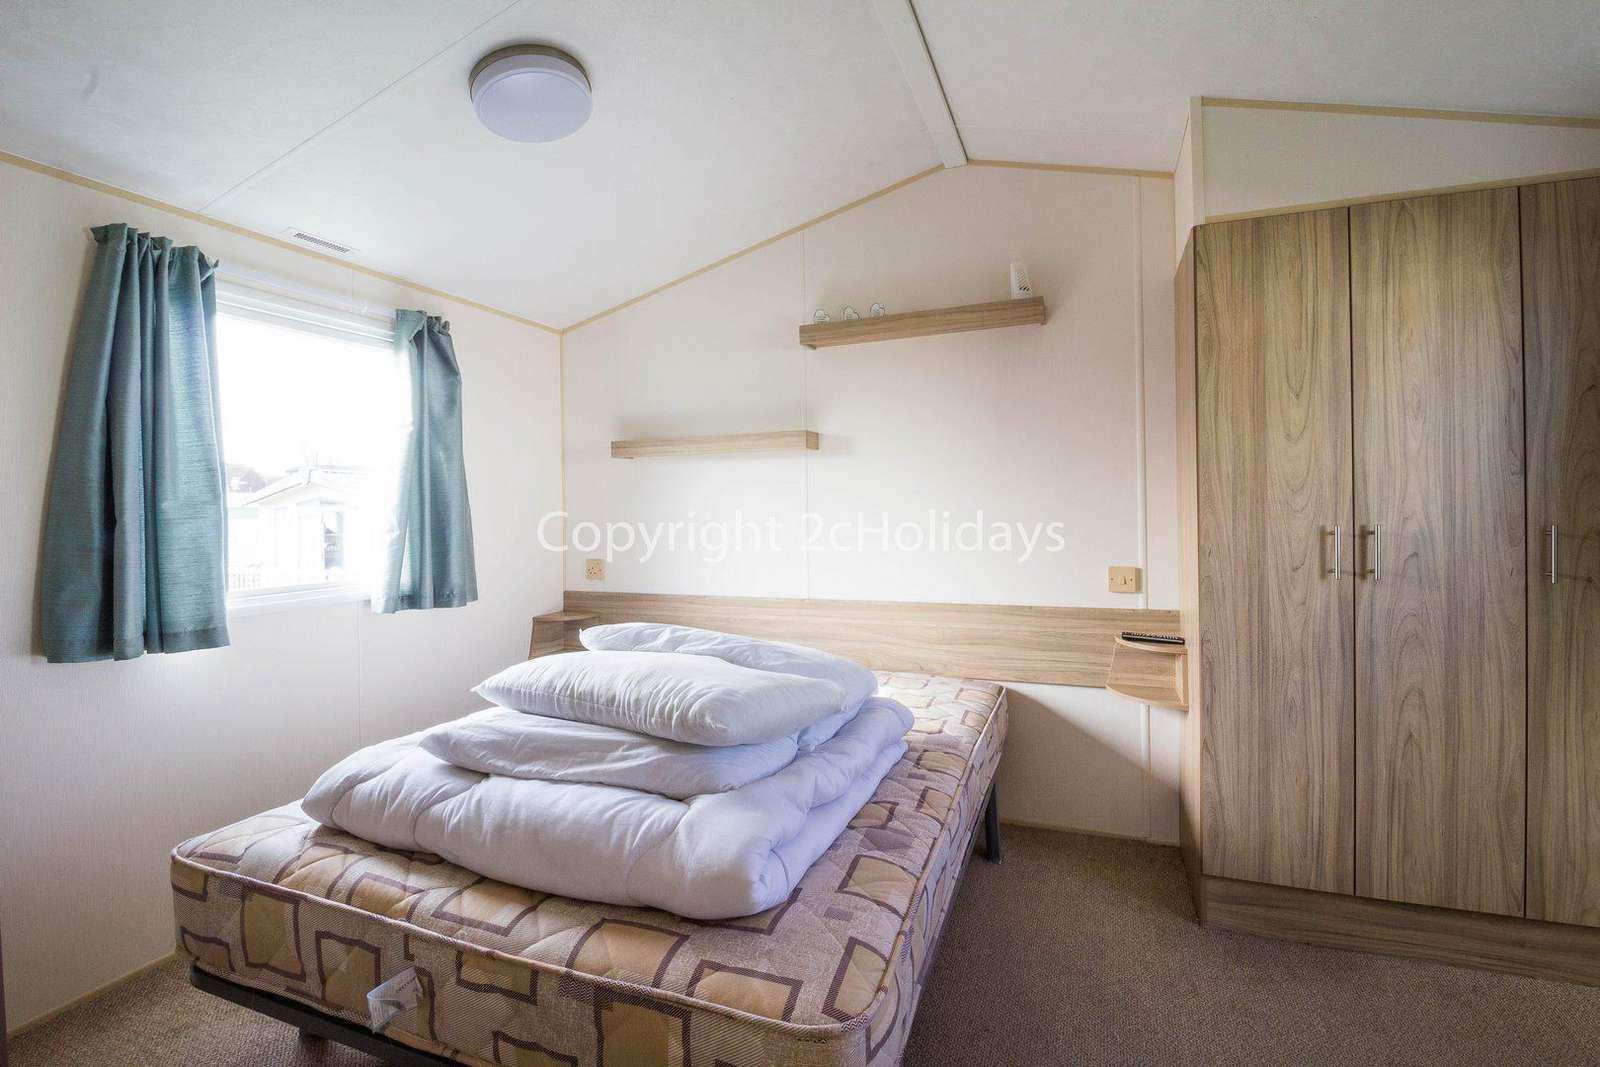 Coastal accommodation in Great Yarmouth